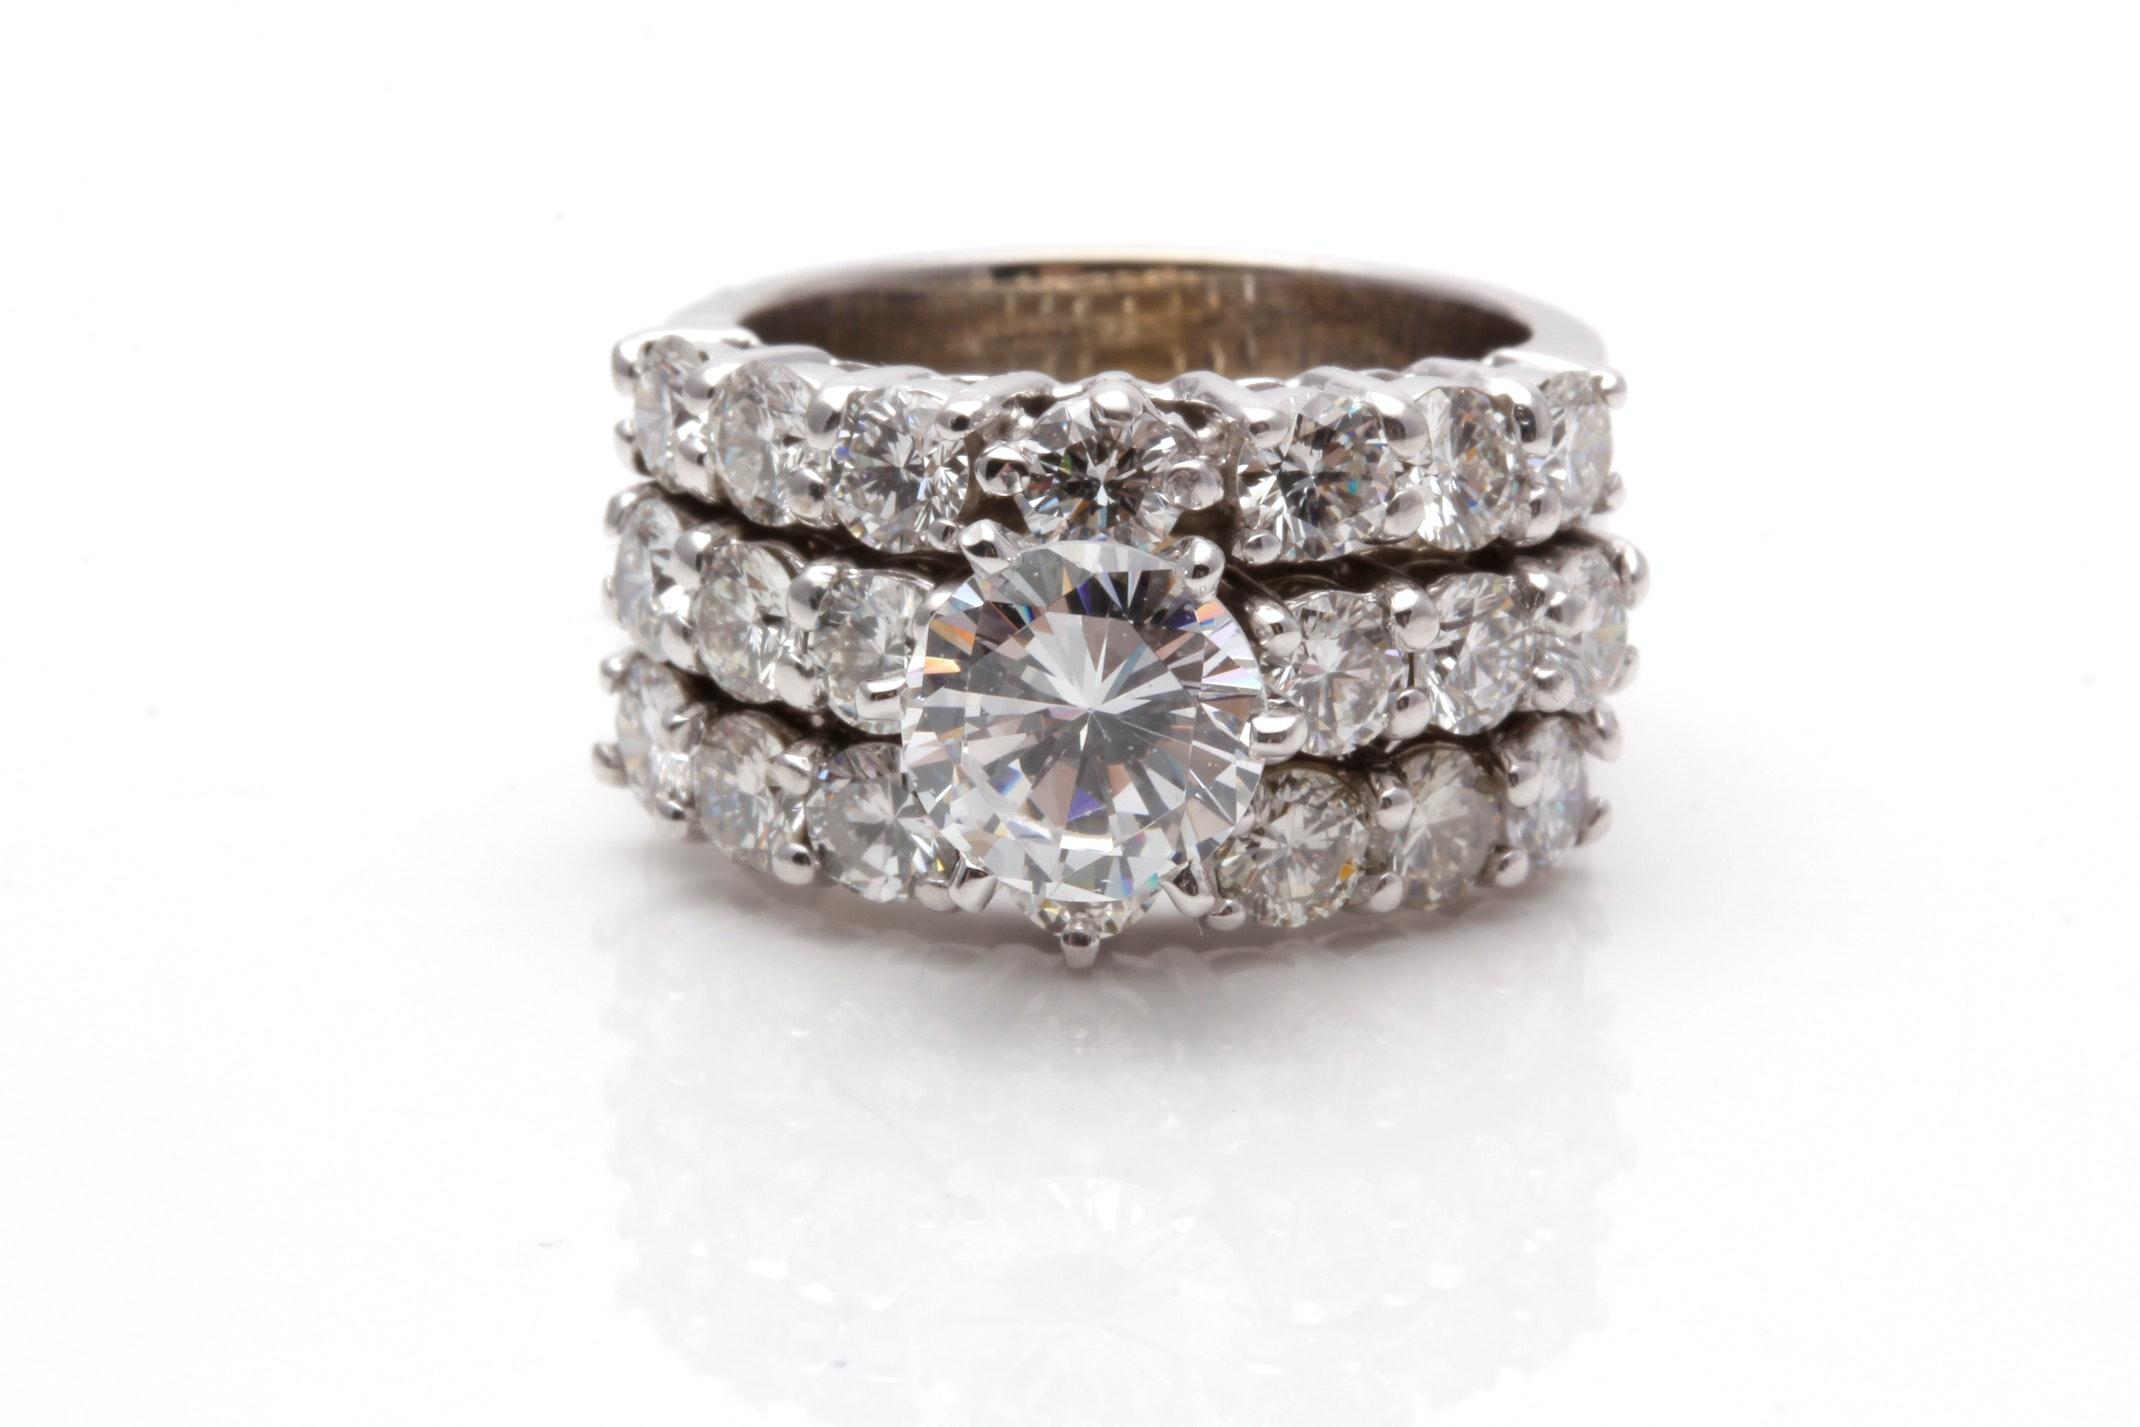 14K White Gold 2.00 CTW Diamond Semi Mount Ring With Cubic Zirconia Center Stone